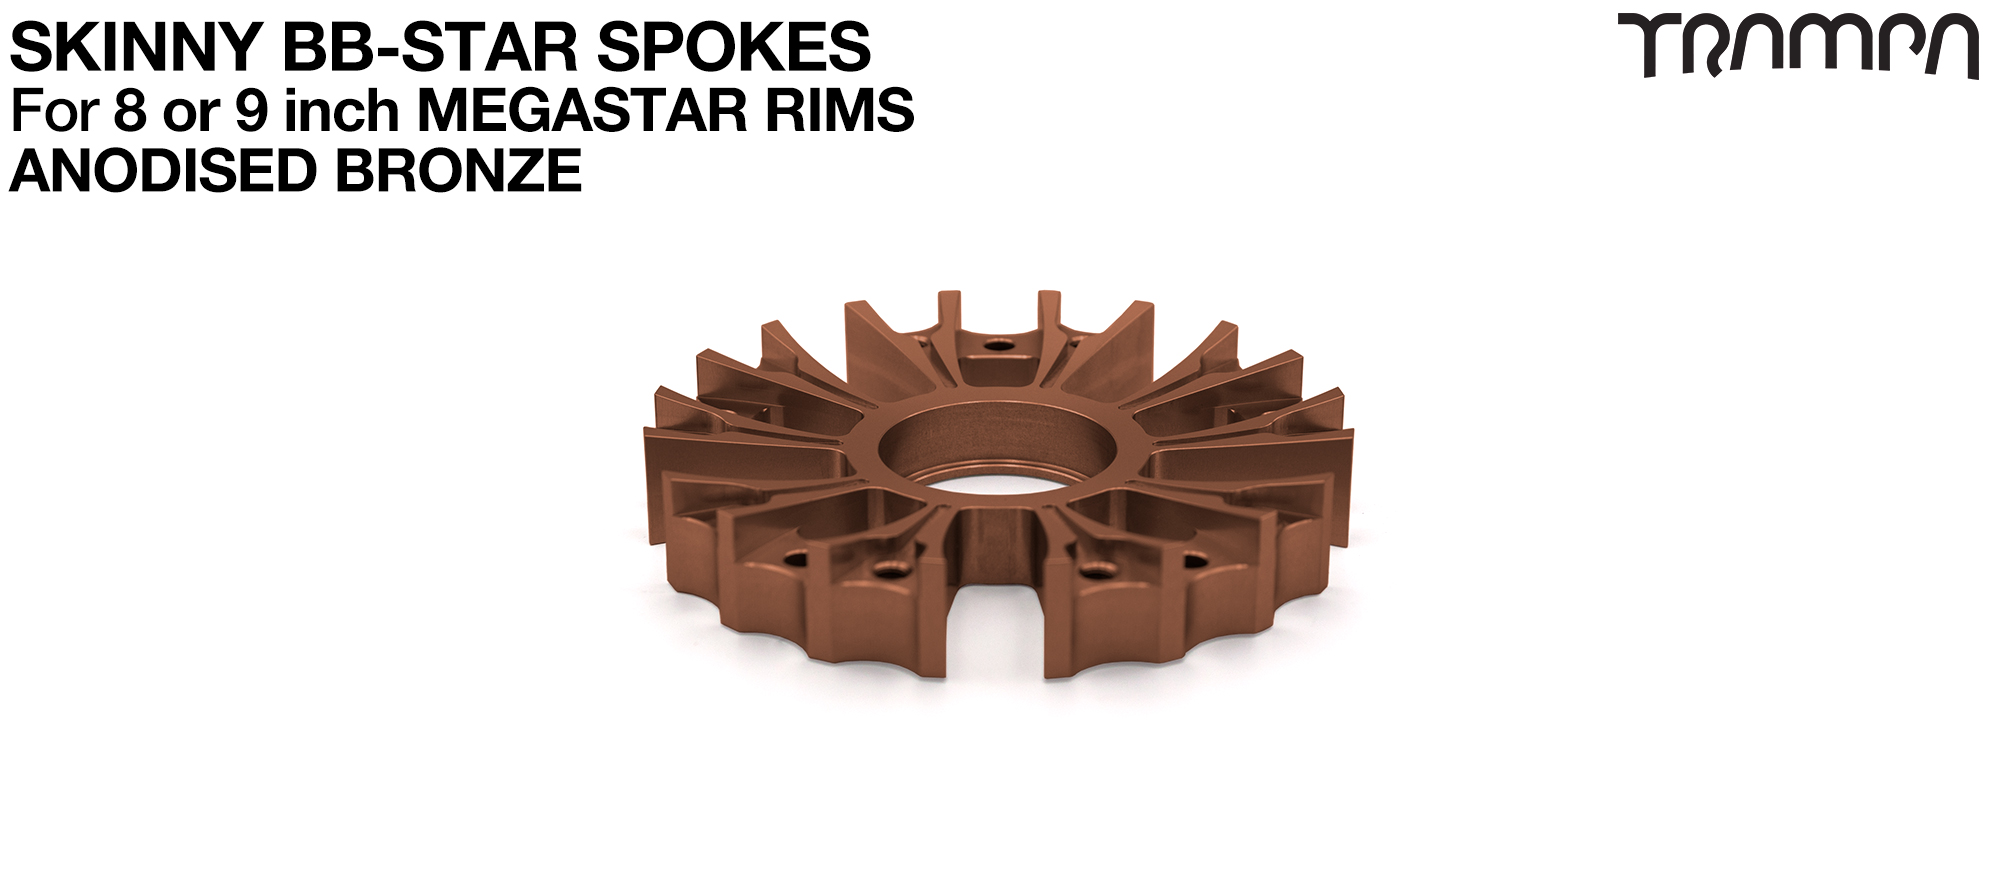 BB Star Spoke for 8 Inch DEEP-DISH MEGASTAR Rim - CNC Precision milled - BRONZE